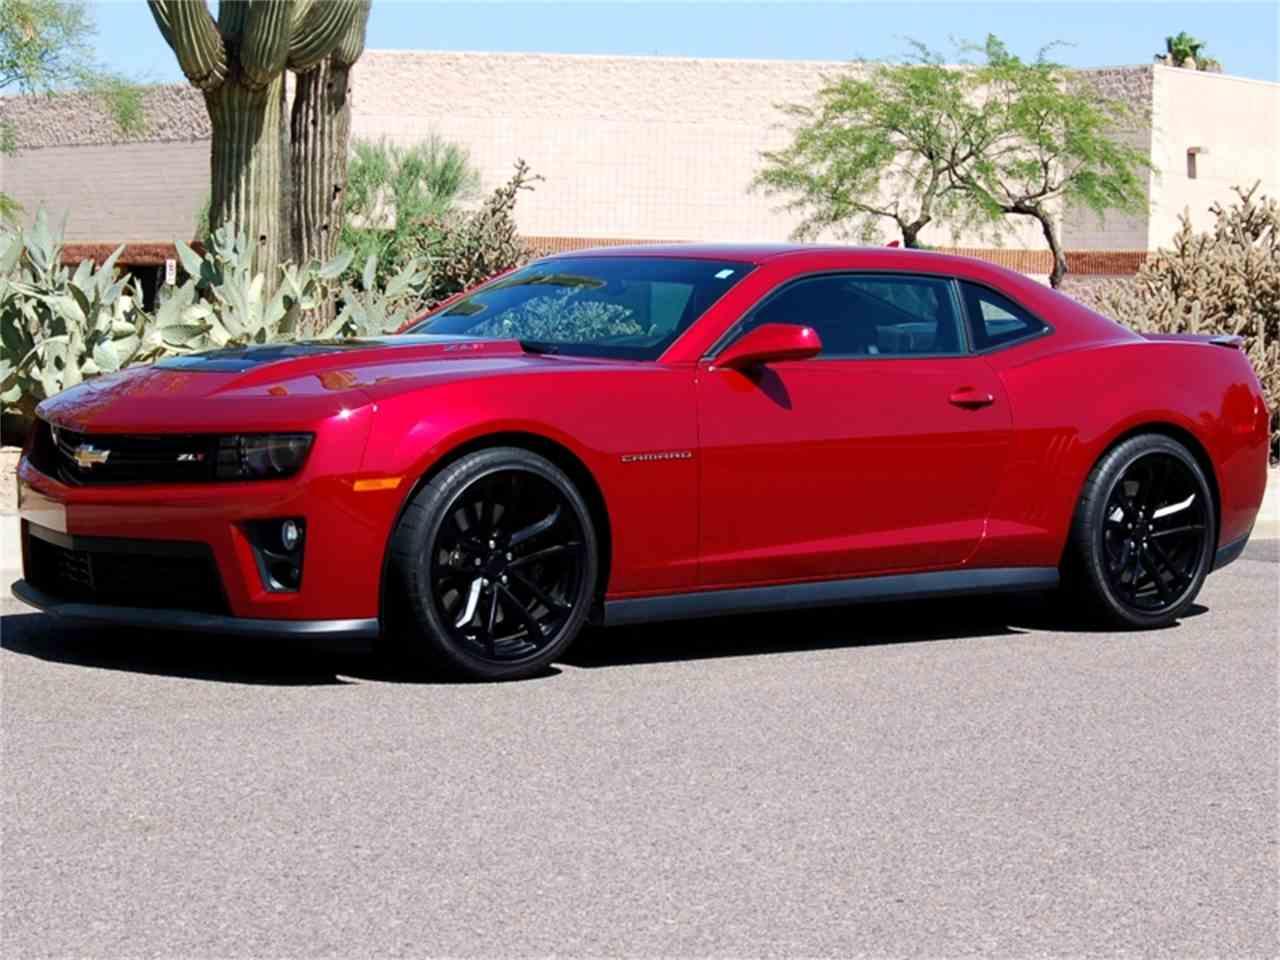 Large Picture of 2013 Camaro located in Scottsdale Arizona Auction Vehicle - LB2K